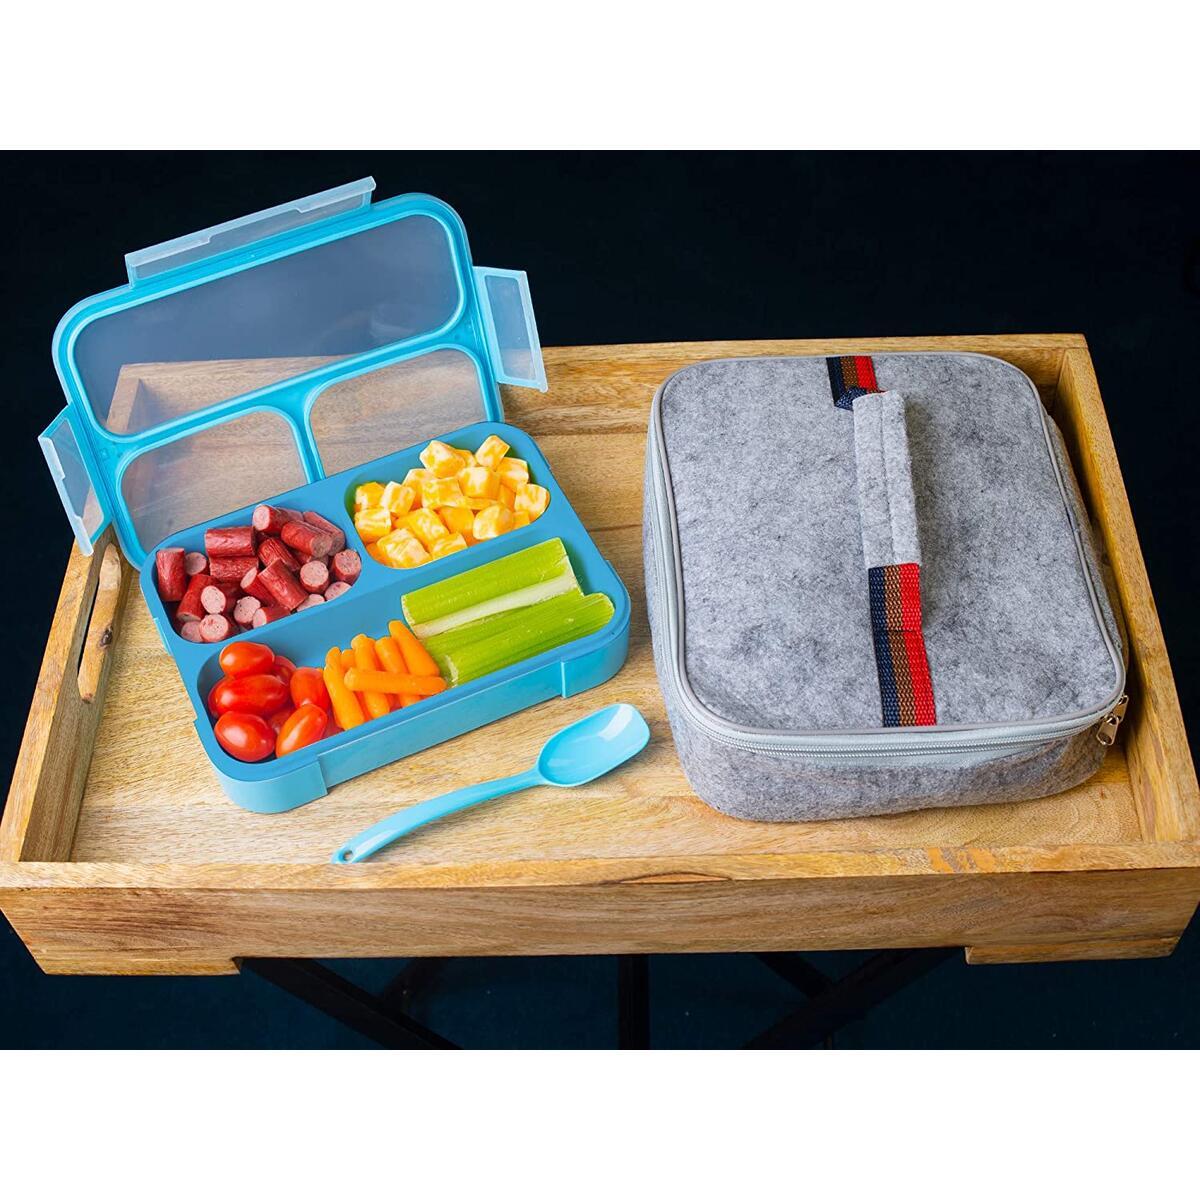 Bento Box & Tote Bag - Spoon Included